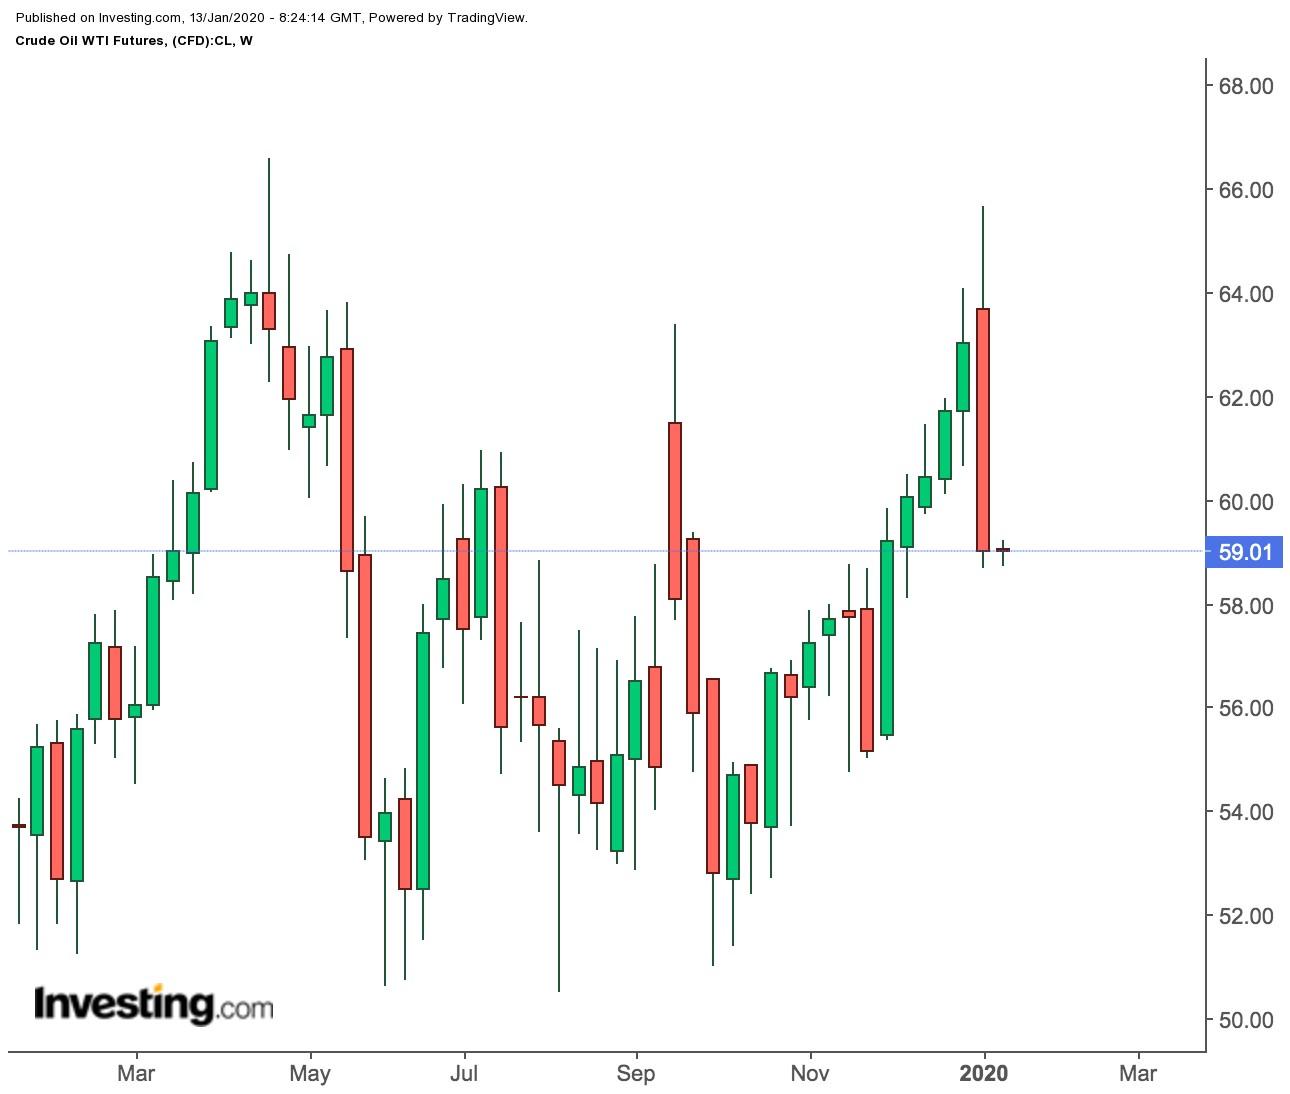 WTI Futures Weekly Price